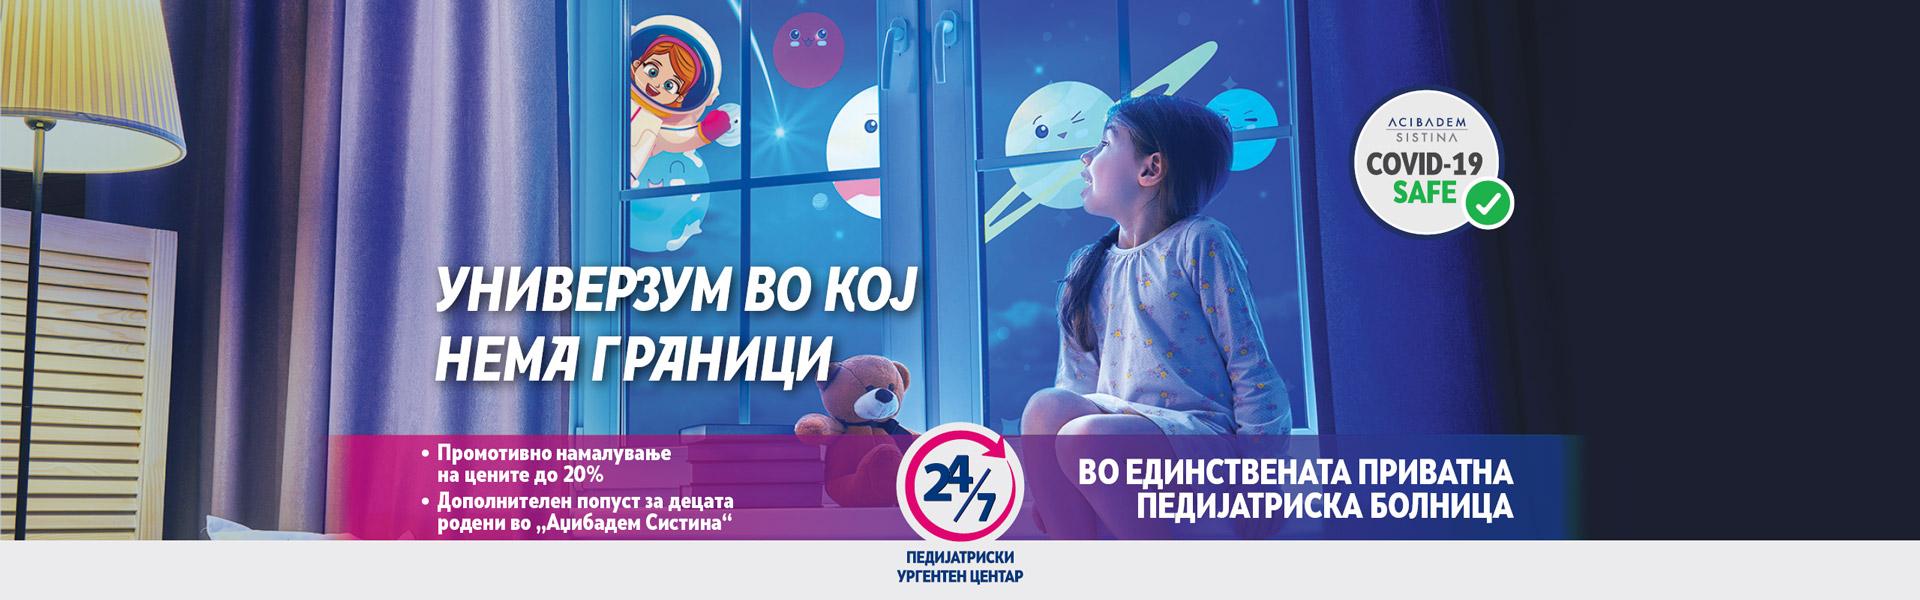 Pediatrija Space MK